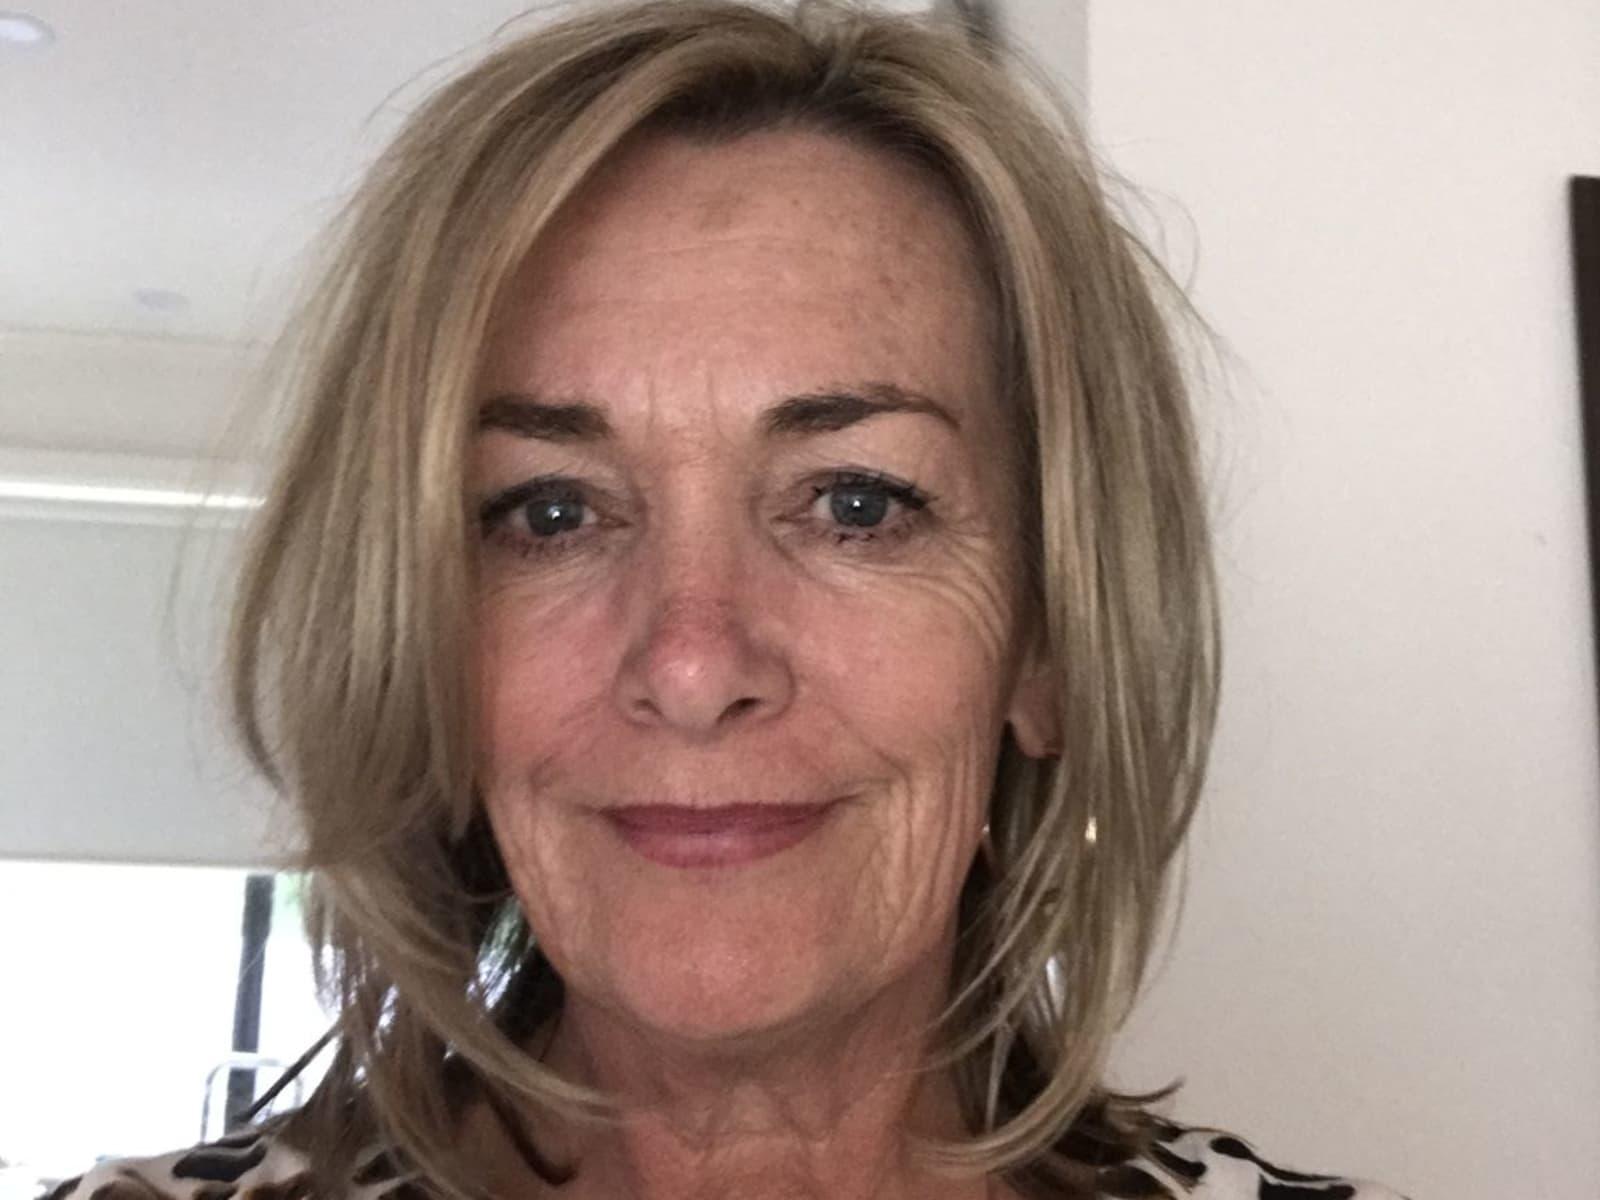 Jill from Drysdale, Victoria, Australia